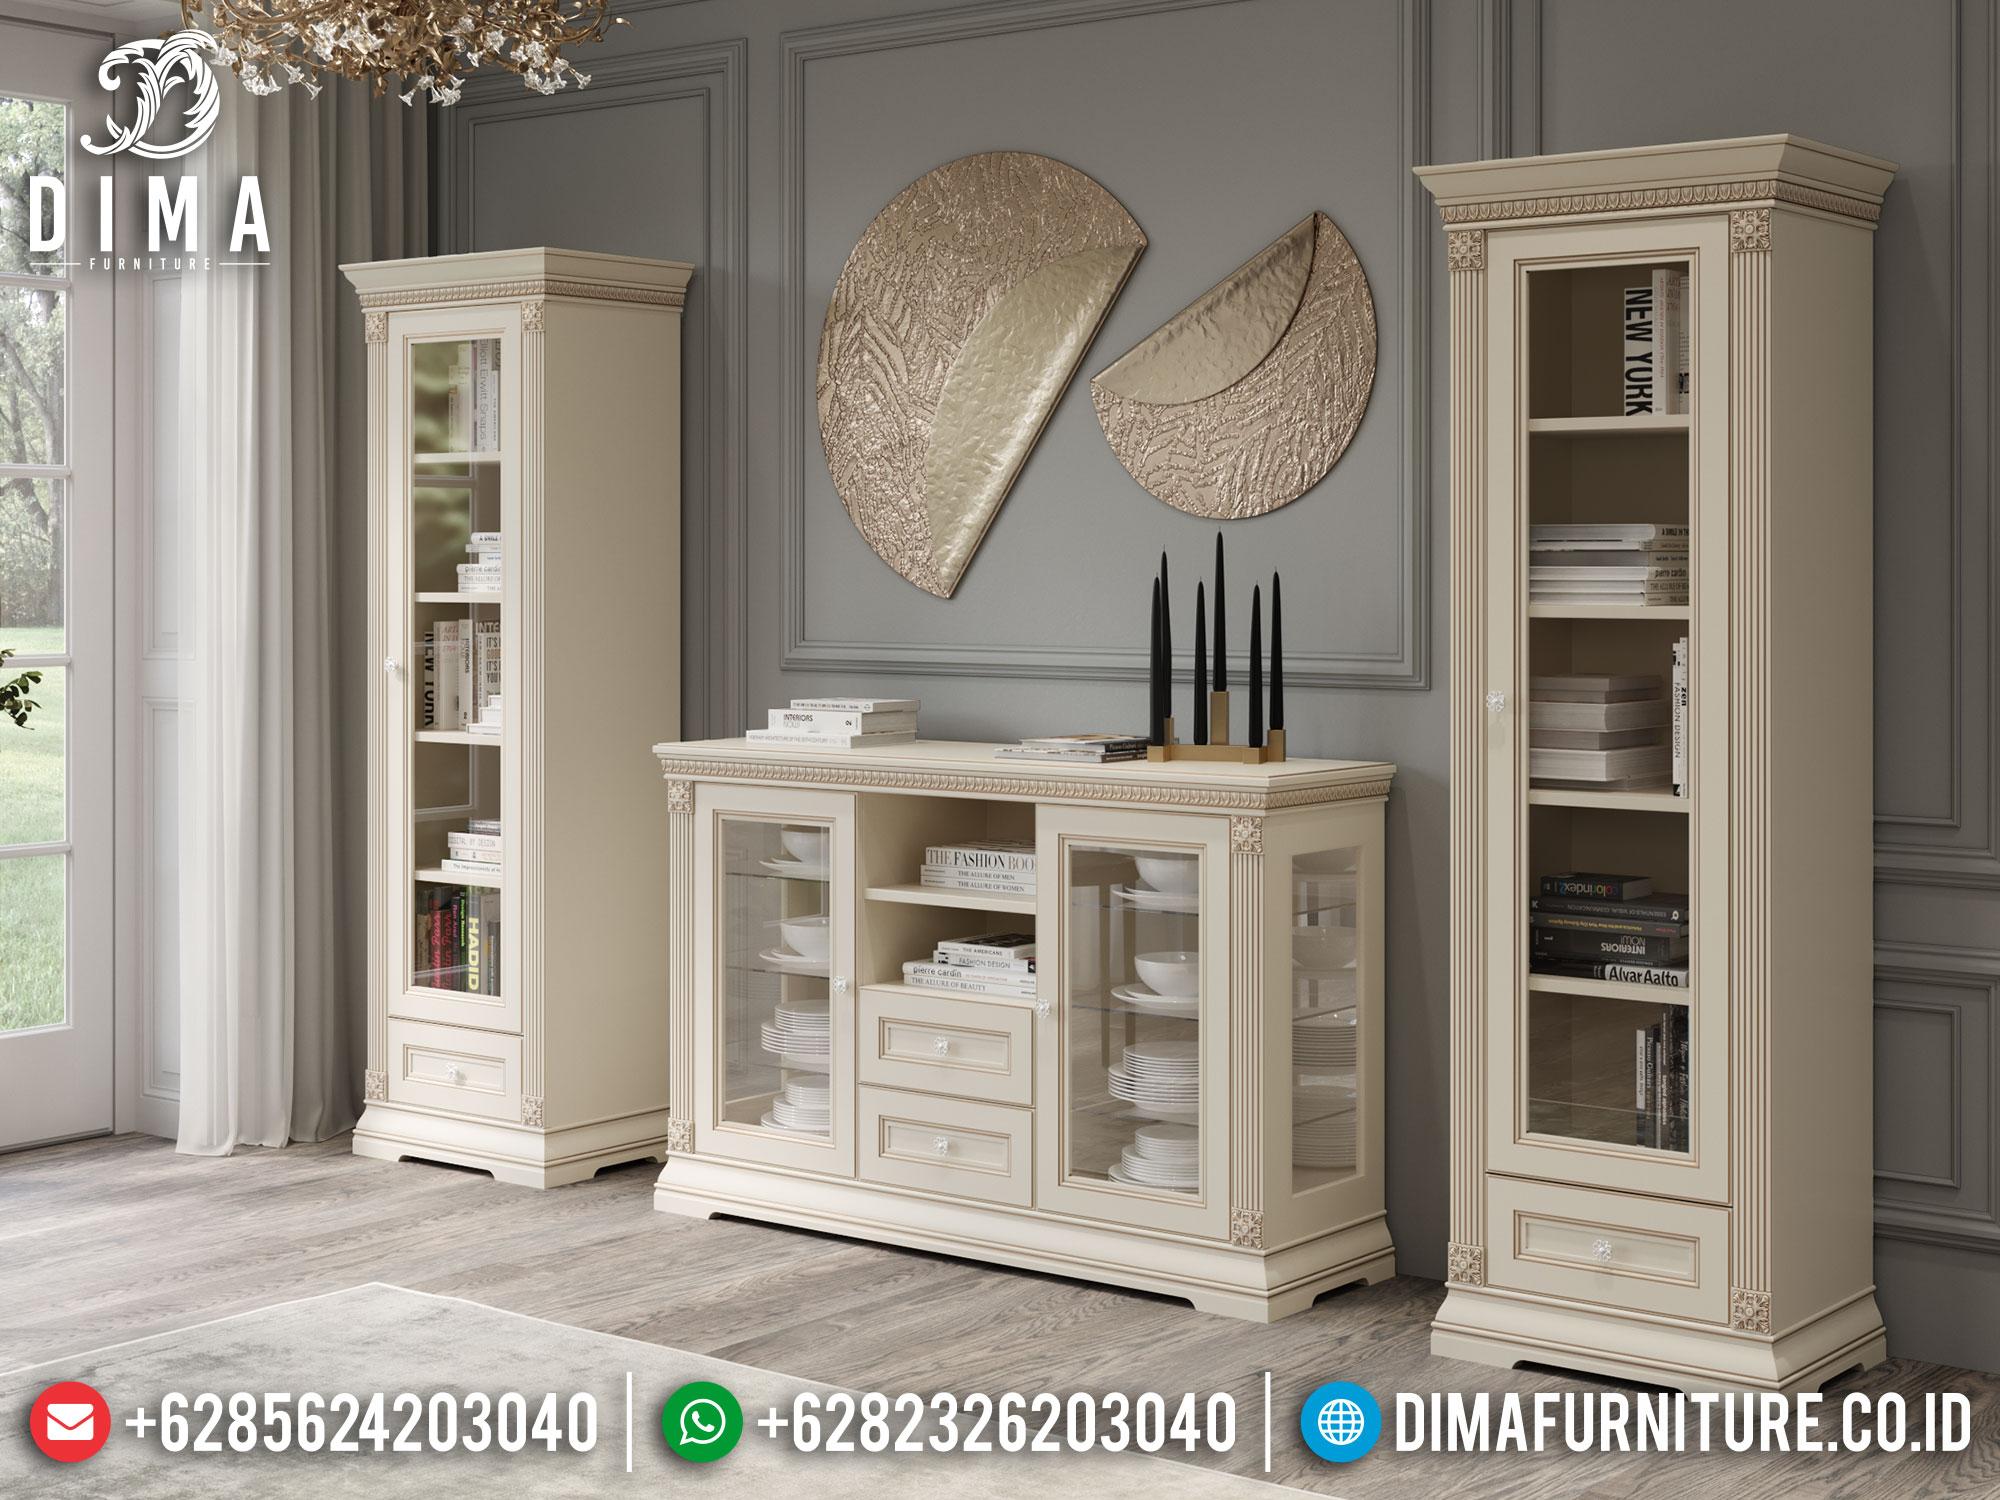 Jual Bufet TV Putih Duco Luxury Classic Style High Quality TTJ-1640